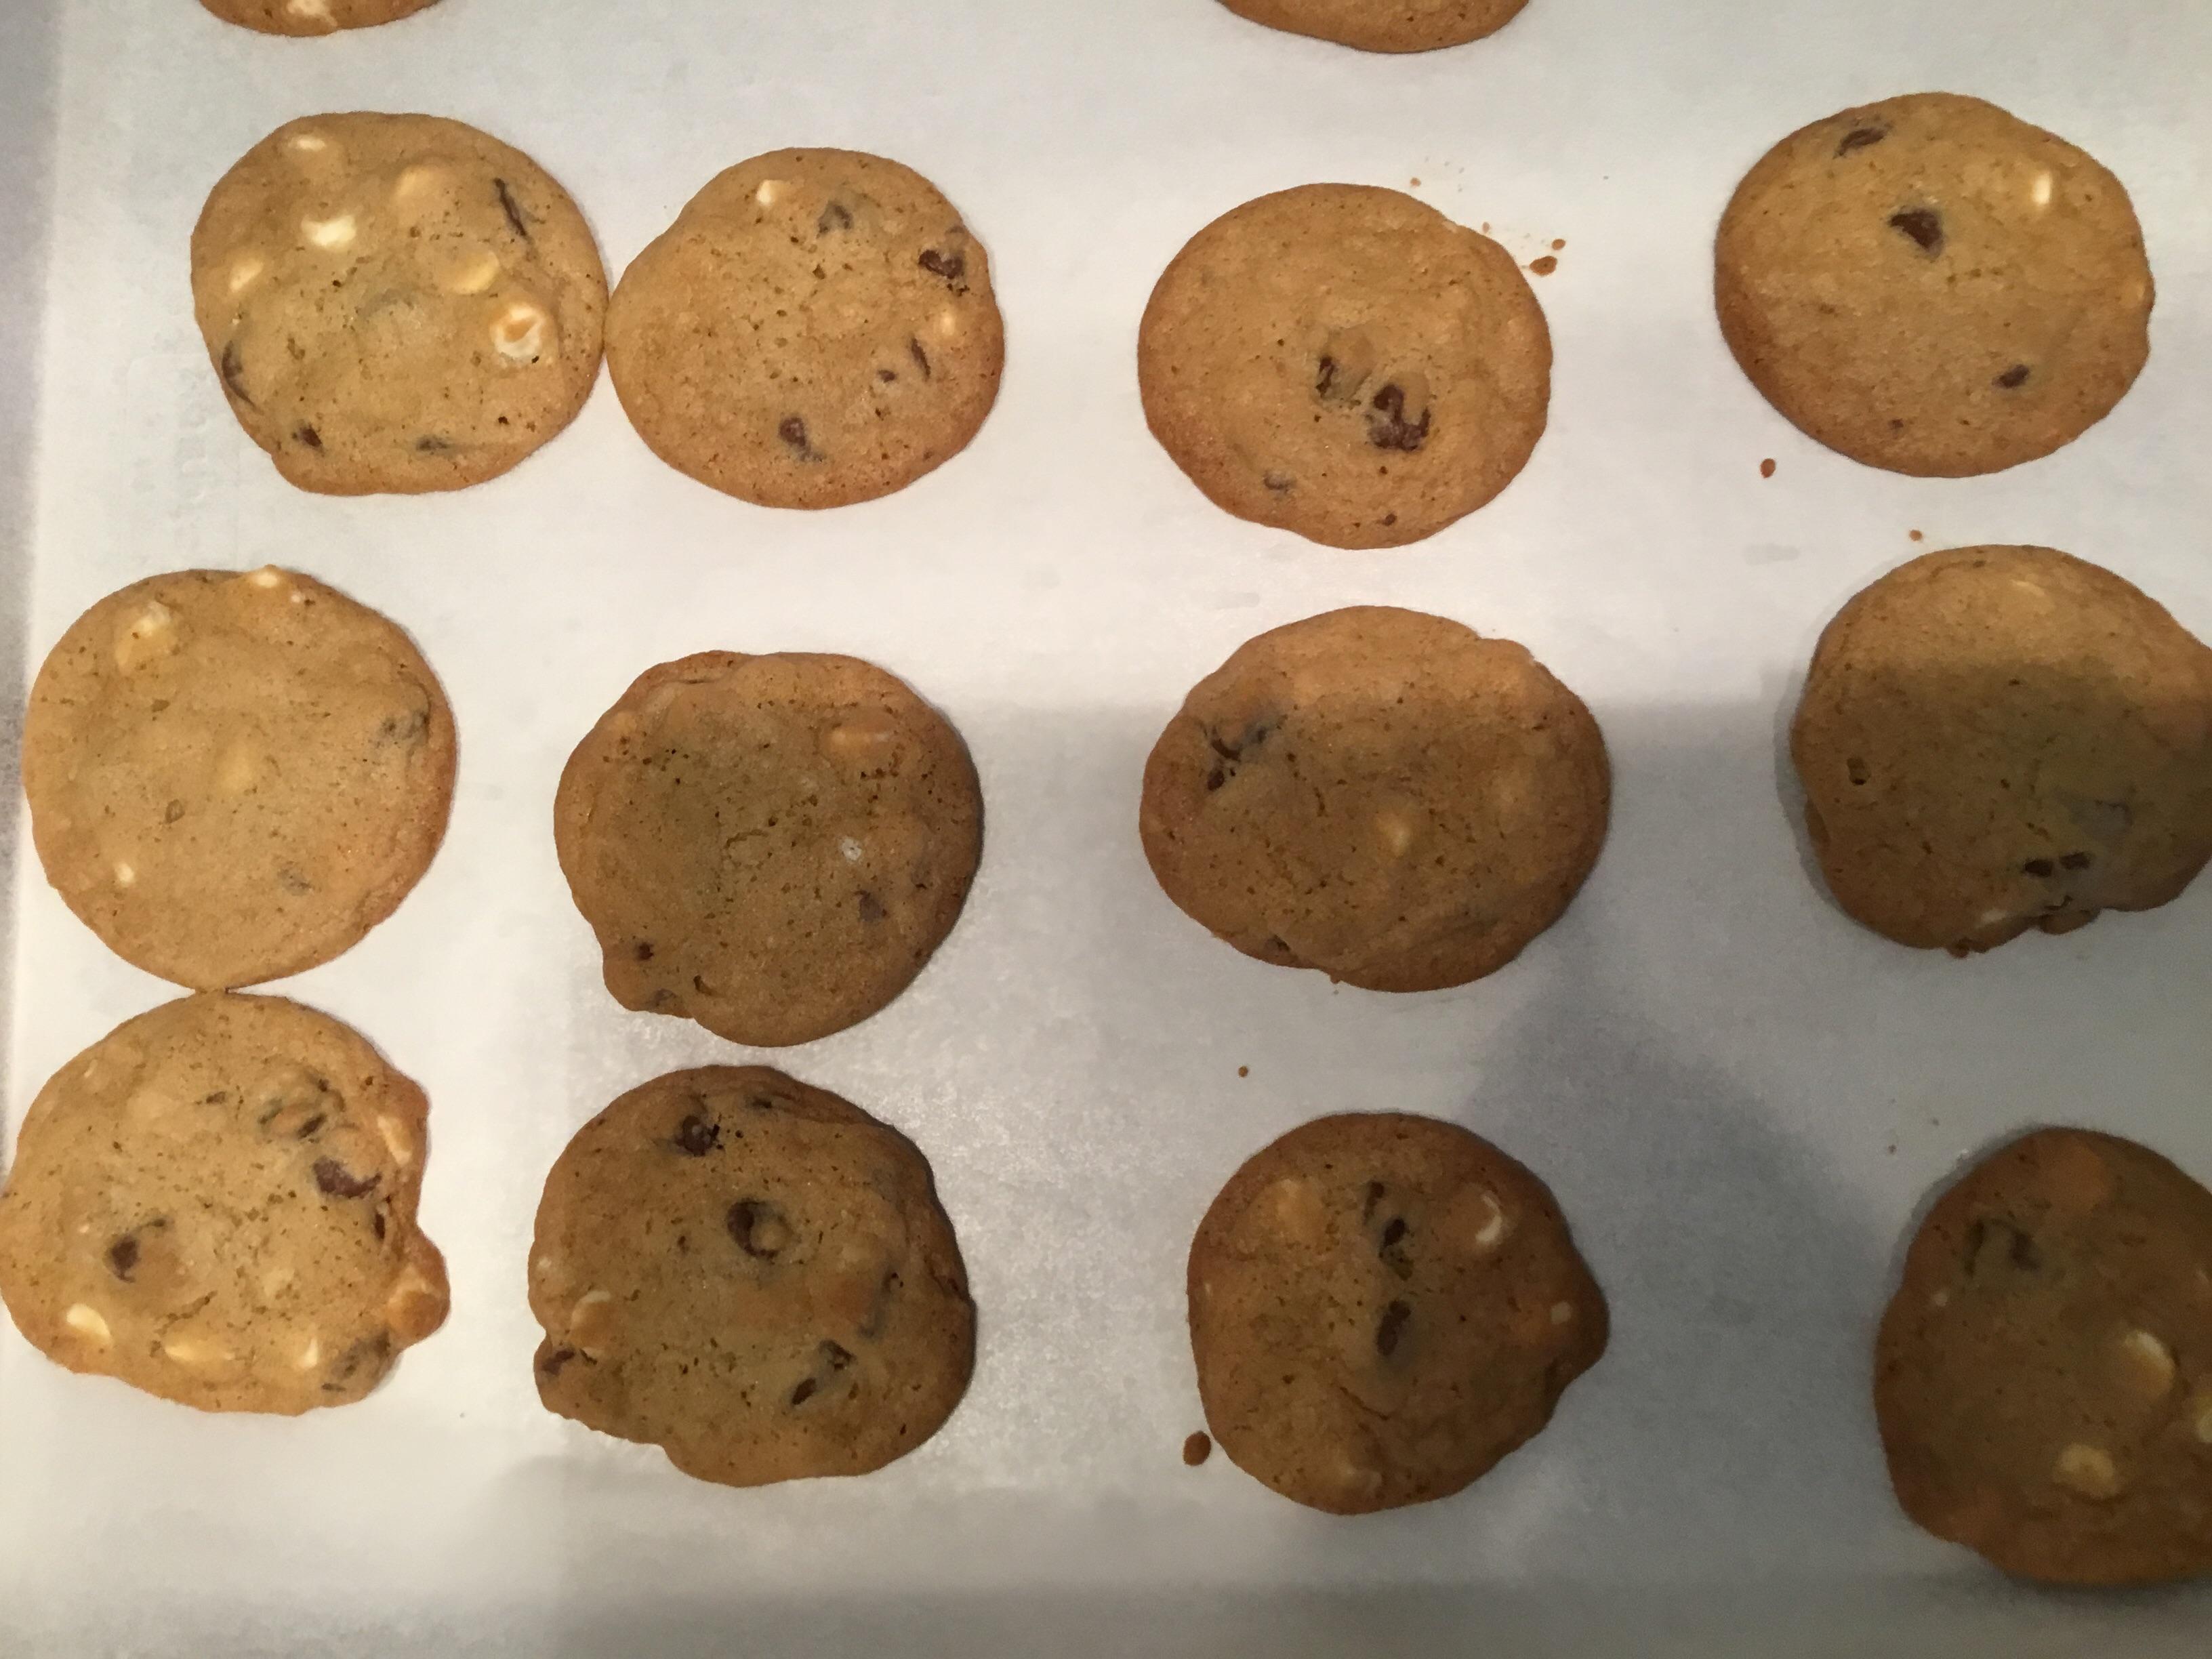 Tiffany's Chocolate Chip Cookies aunty